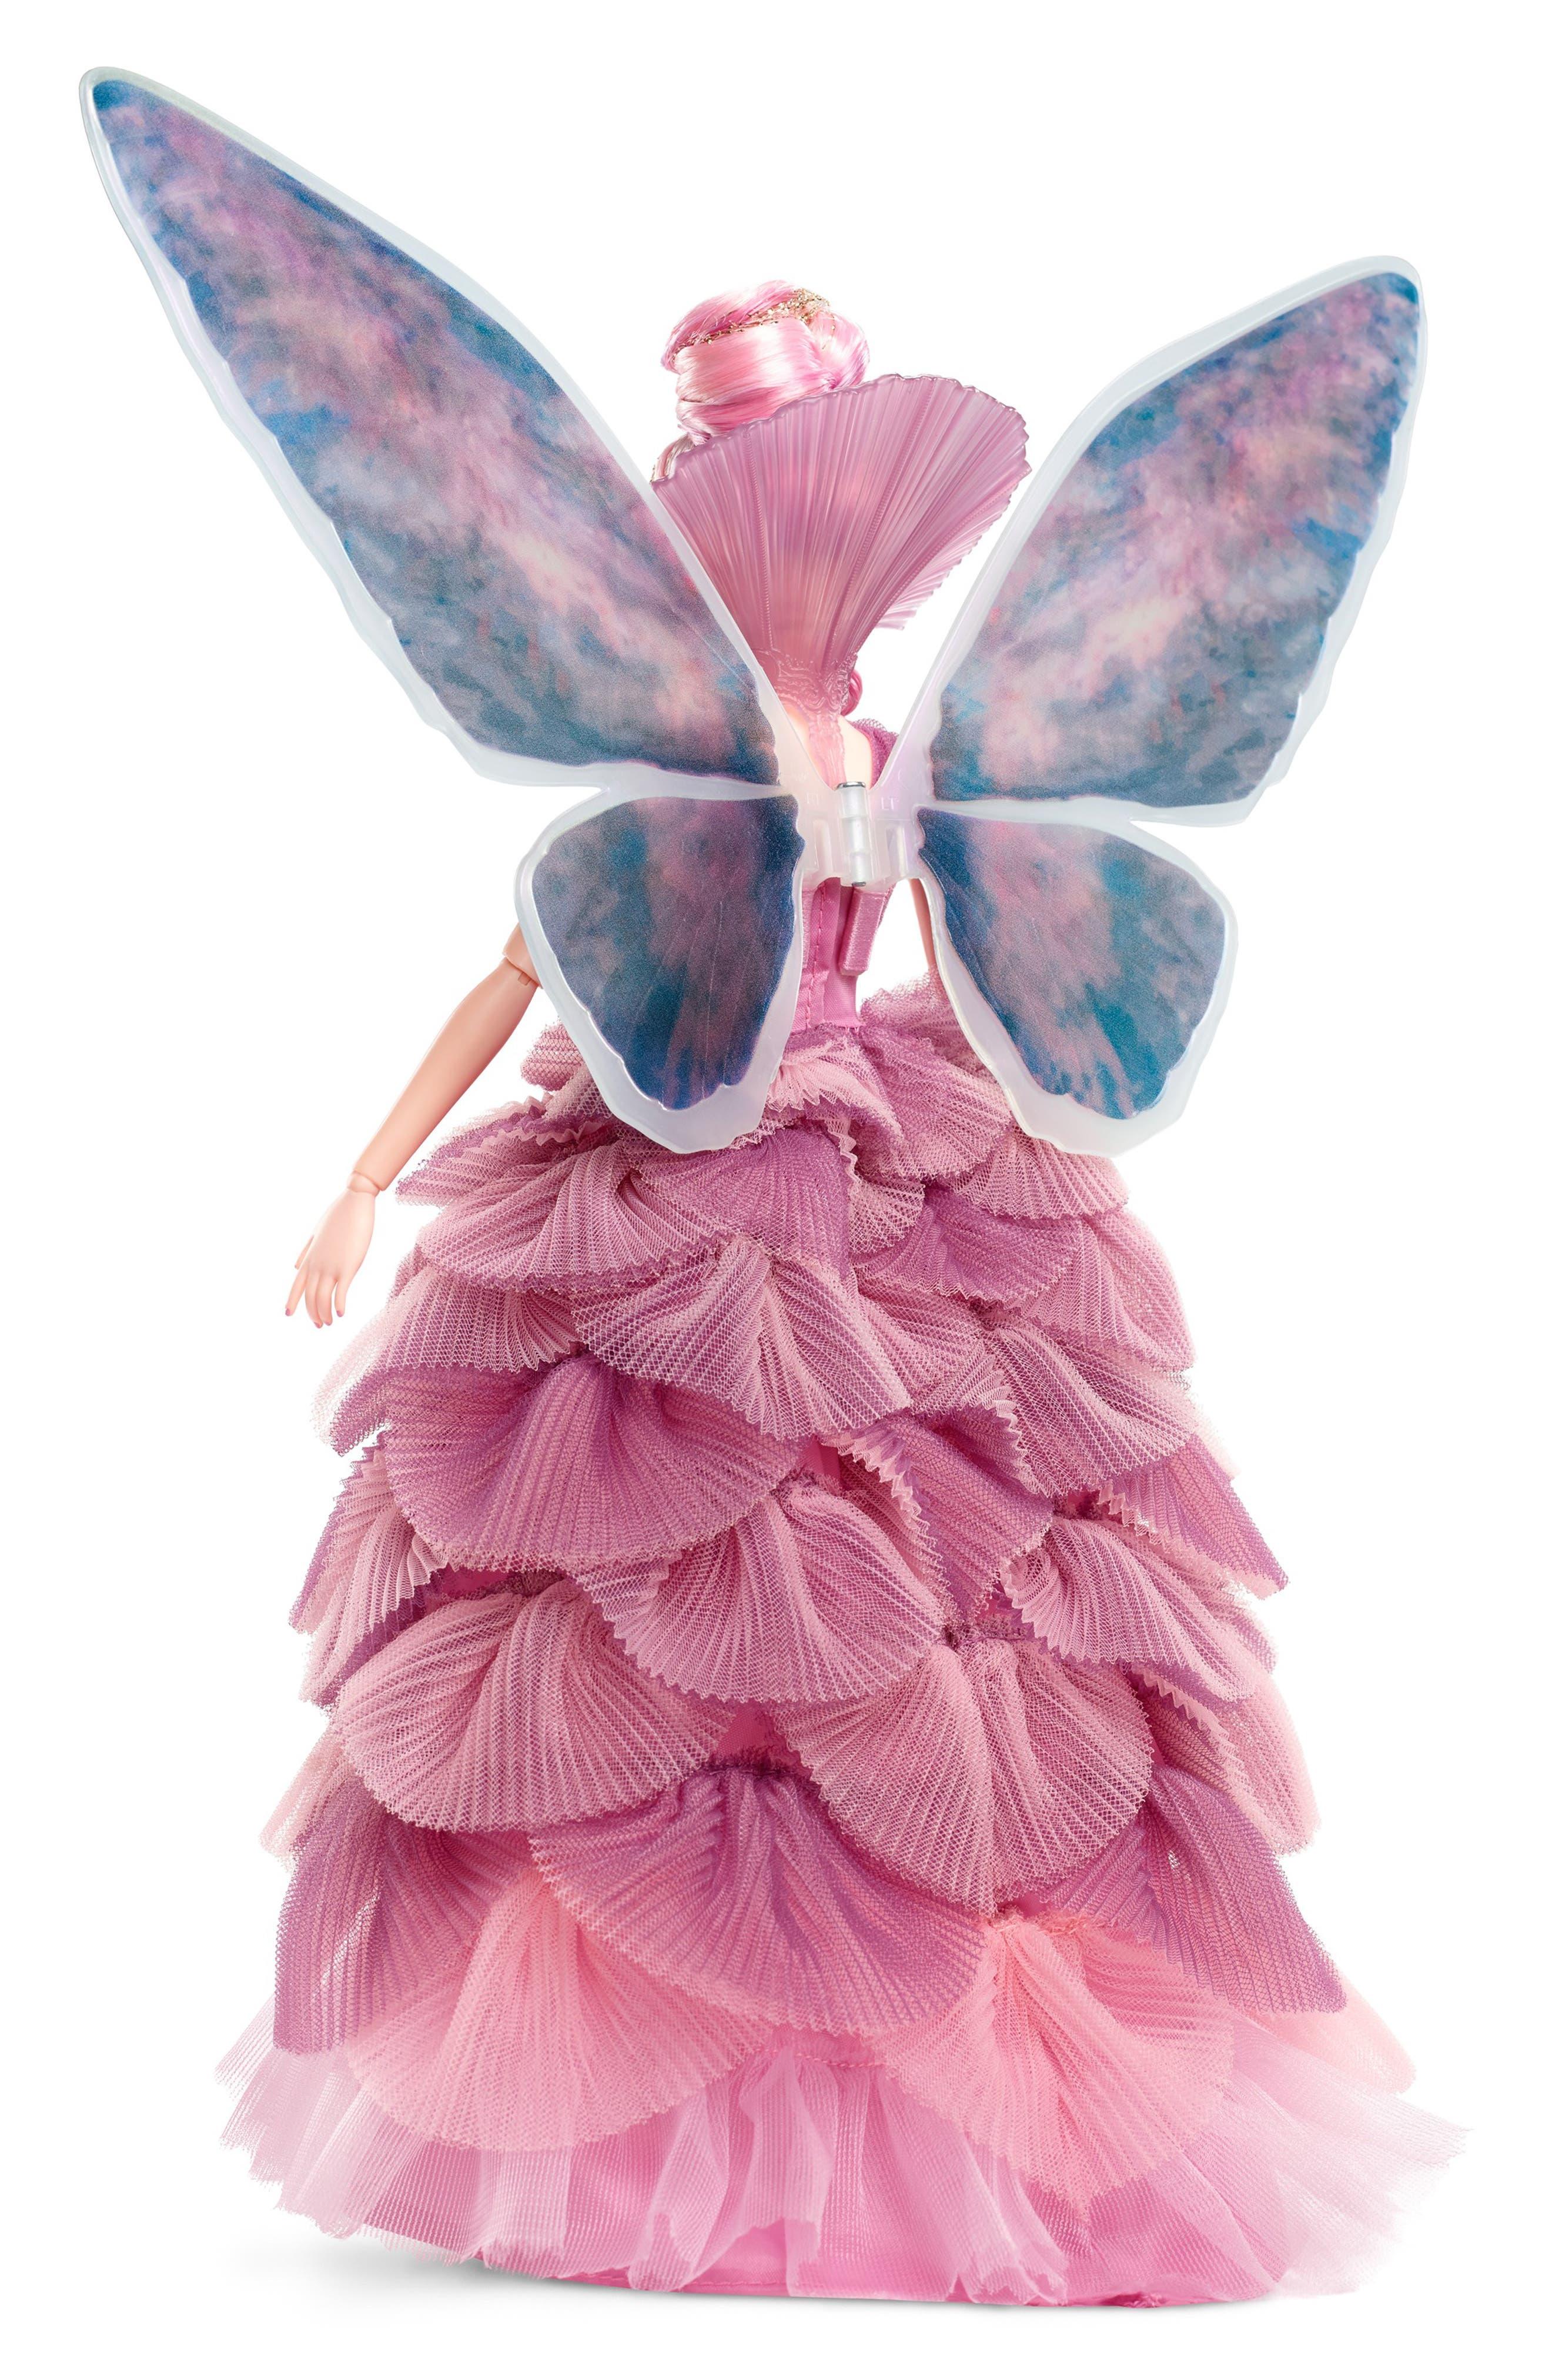 MATTEL,                             Disney<sup>®</sup> The Nutcracker & the Four Realms Sugar Plum Fairy Barbie<sup>®</sup> Doll,                             Alternate thumbnail 2, color,                             960